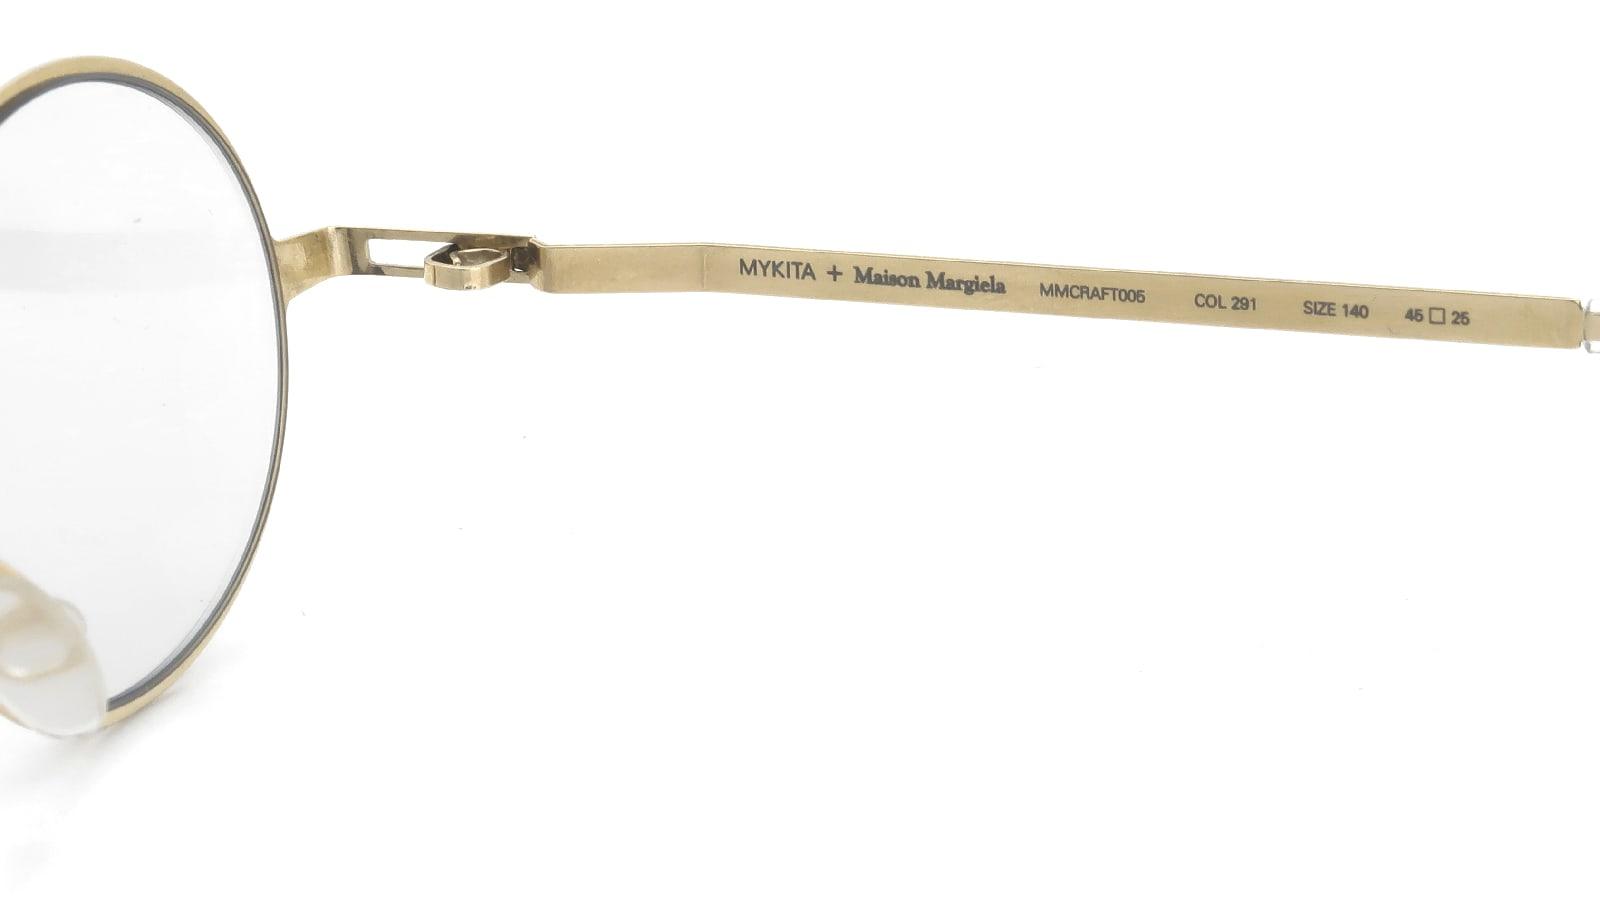 MYKITA + Maison Margiela MMCRAFT005 COL.291 Champagne Gold 10